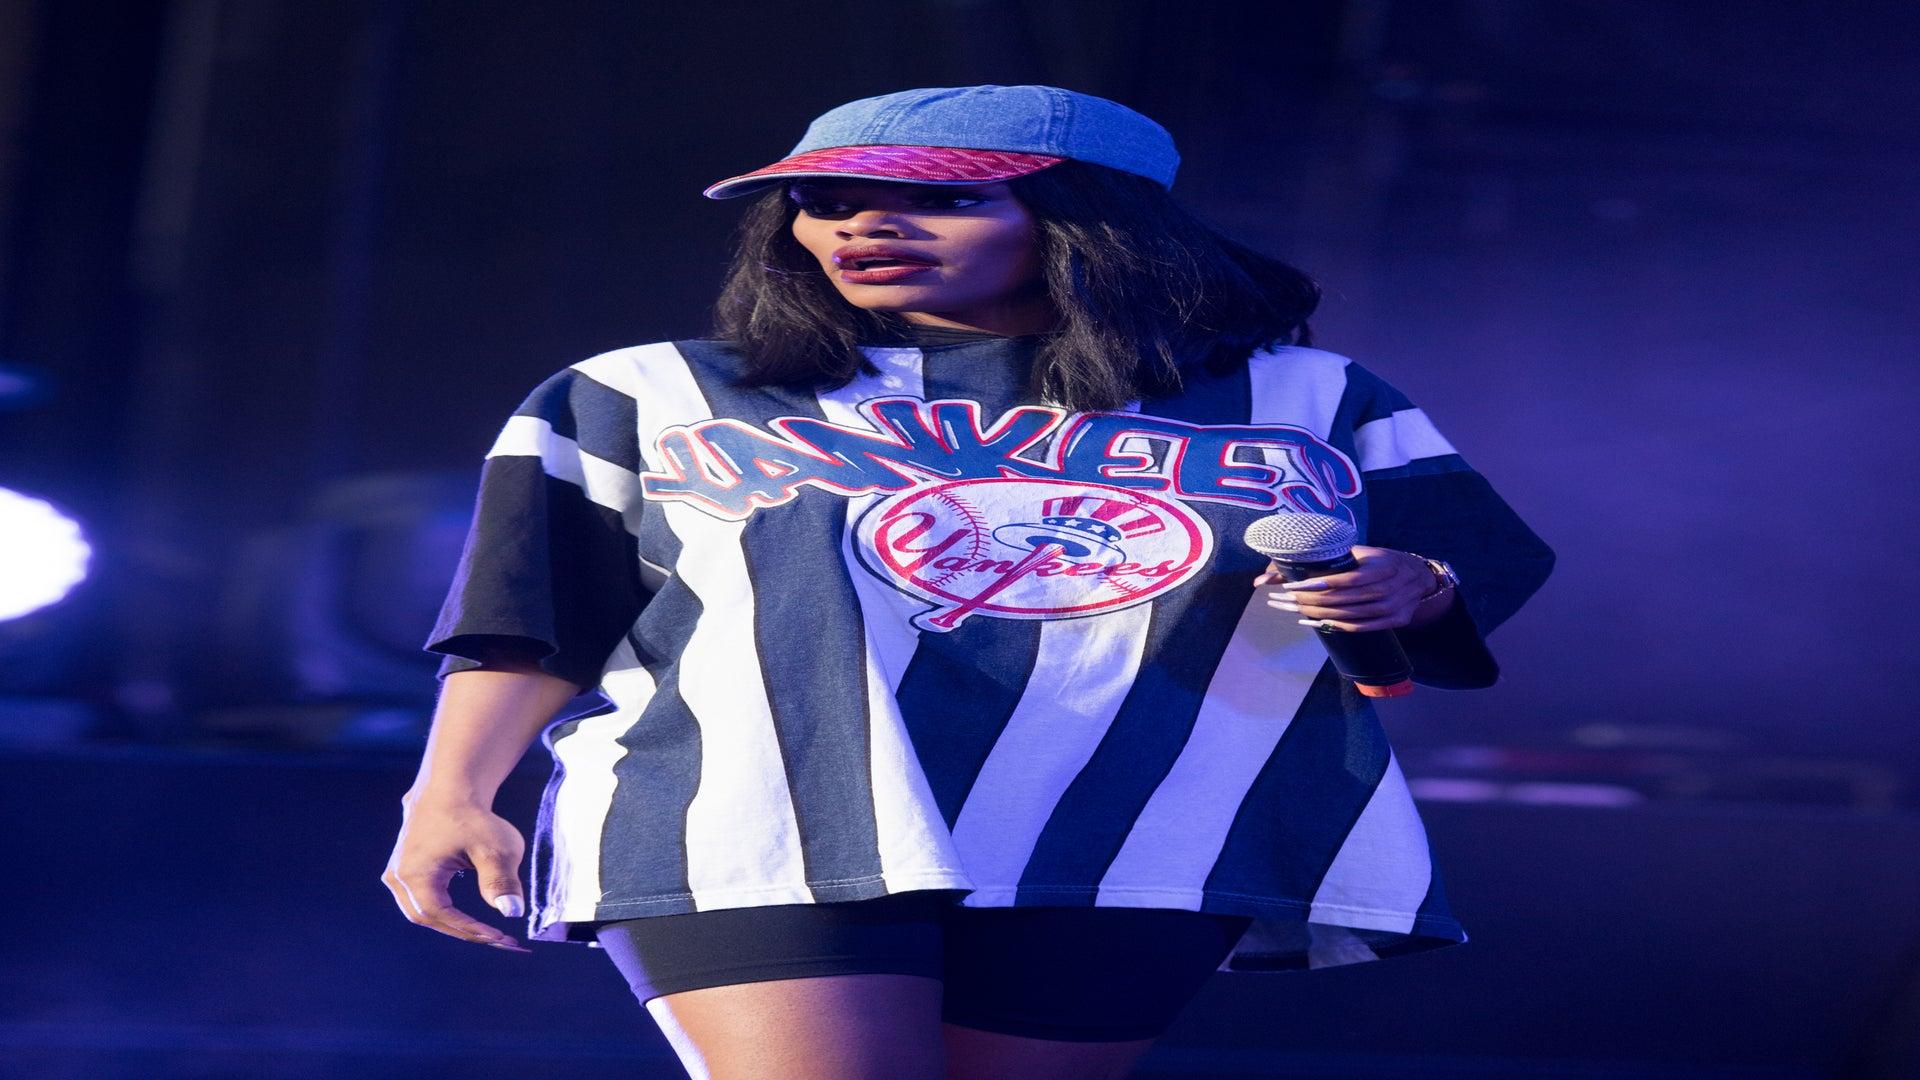 5 Times Teyana Taylor's Vocals Blew Us Away